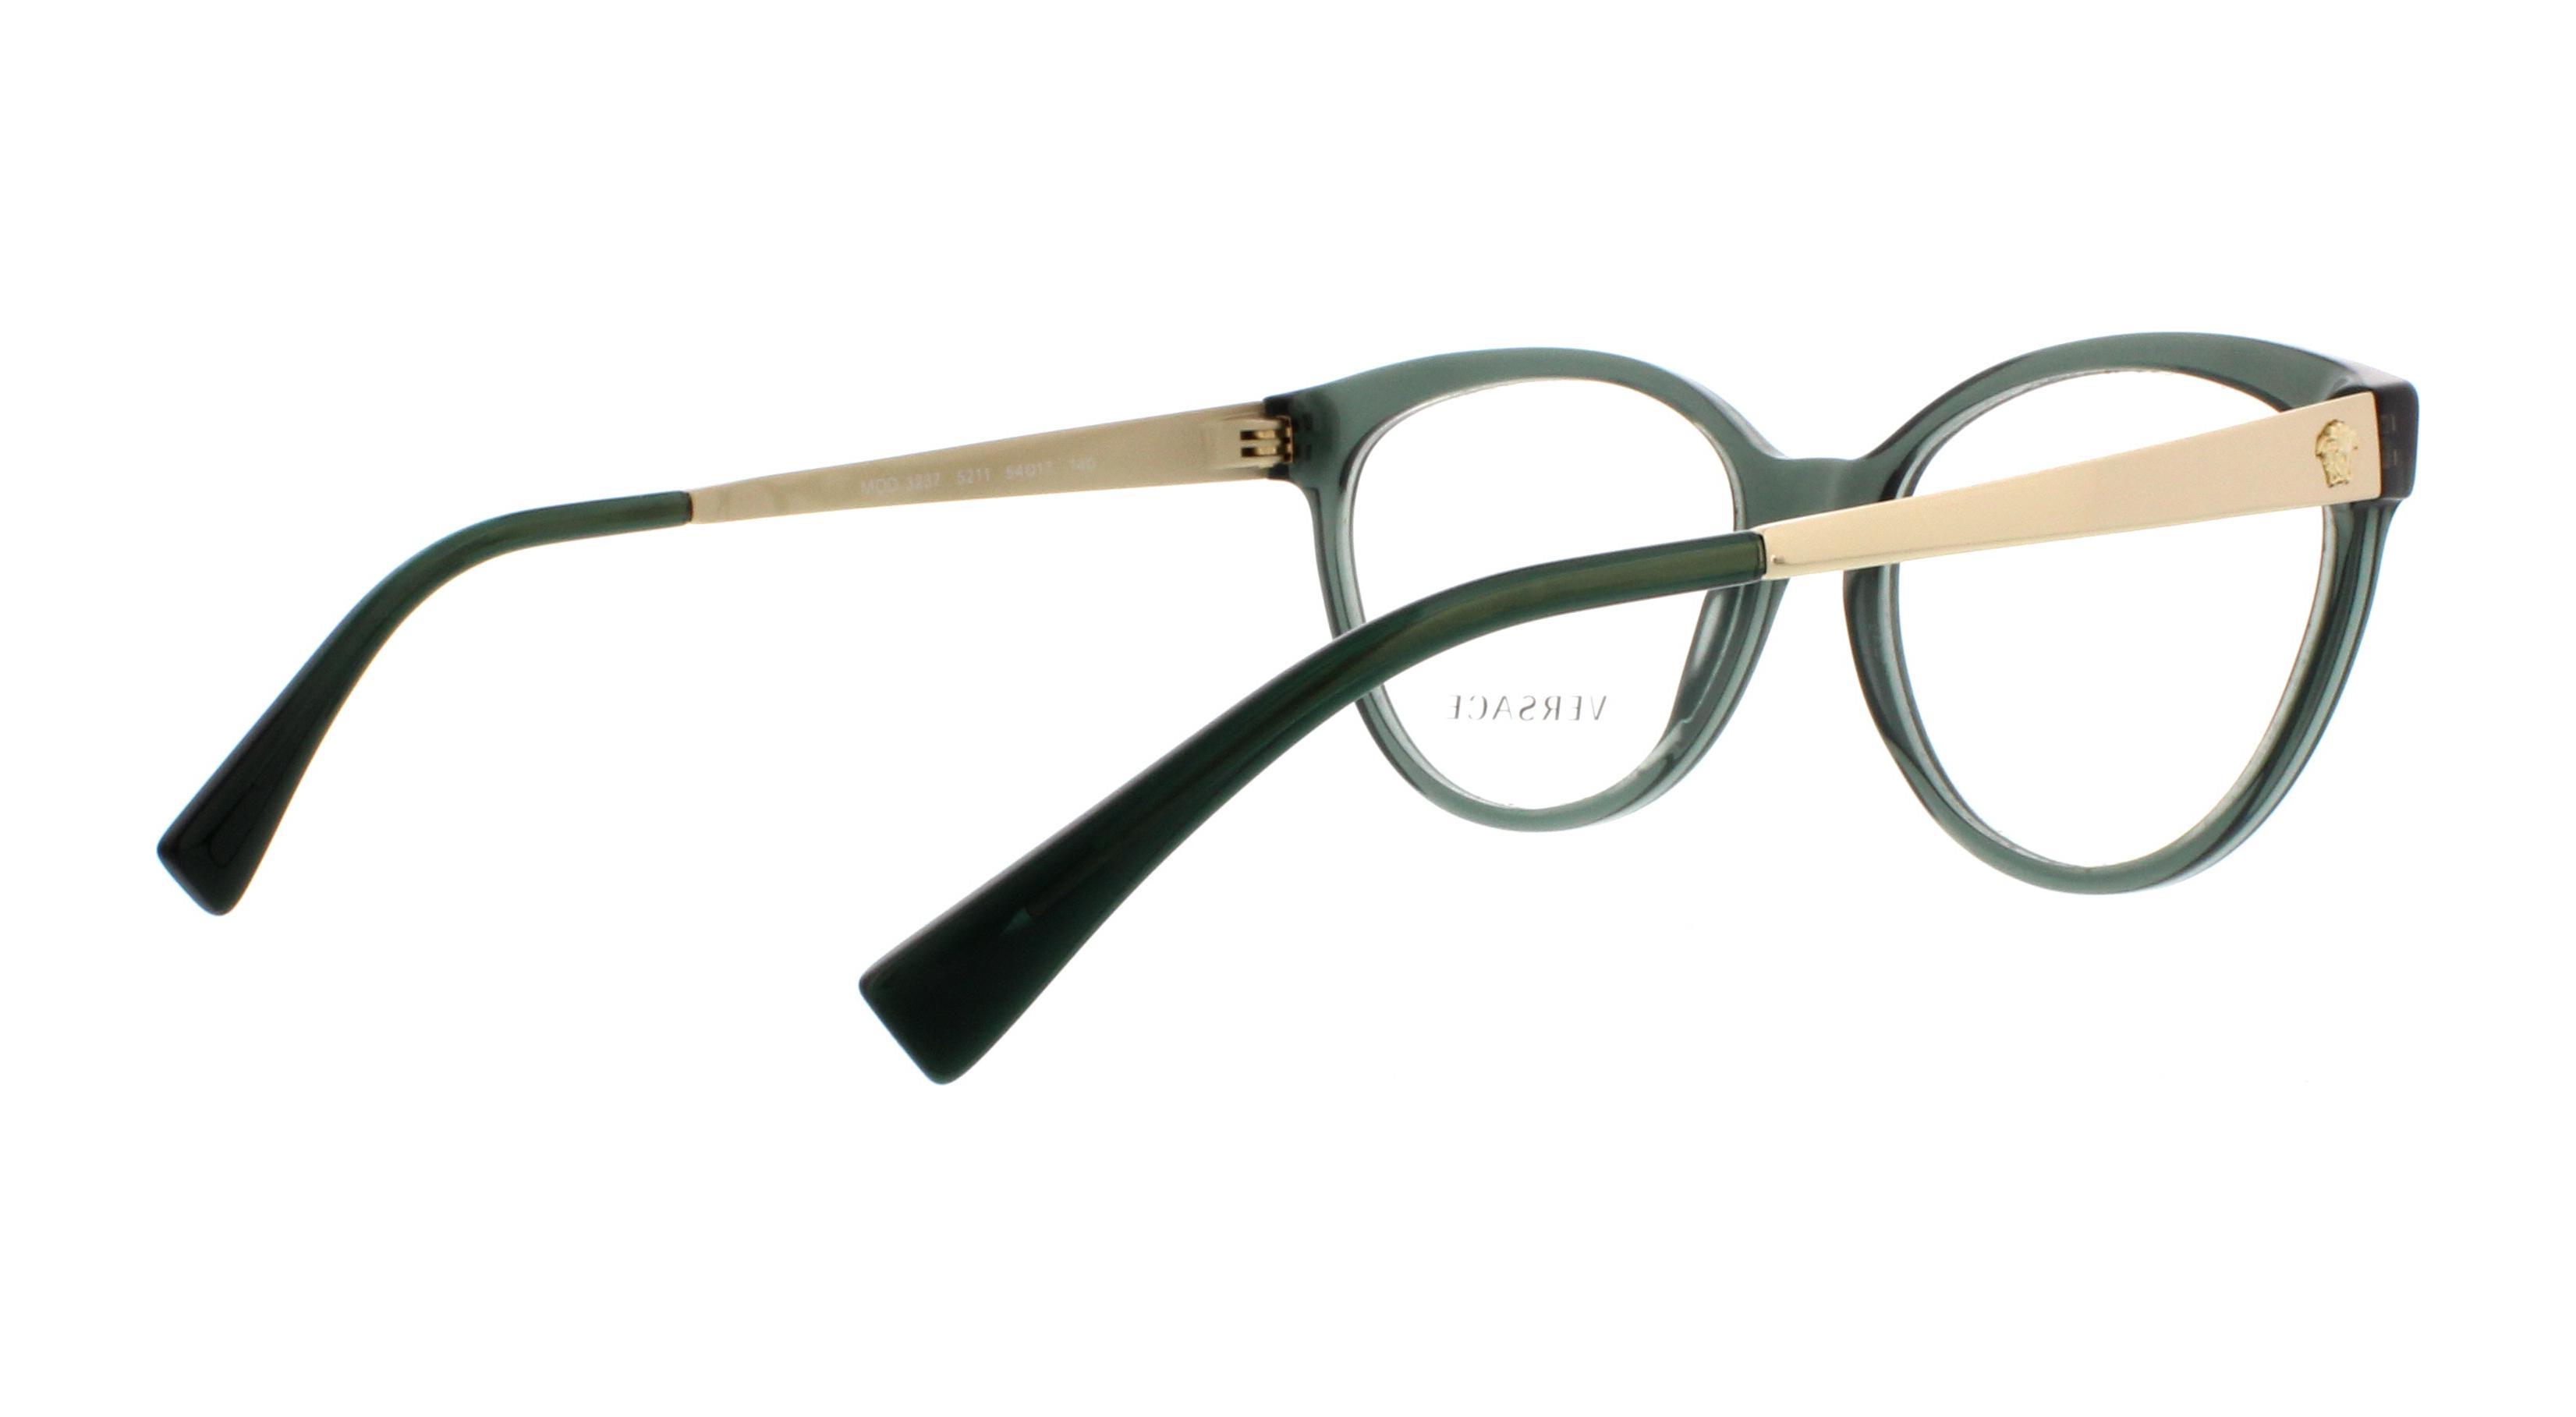 f9cb605a6b6 Versace Eyeglasses Ebay Ve3167